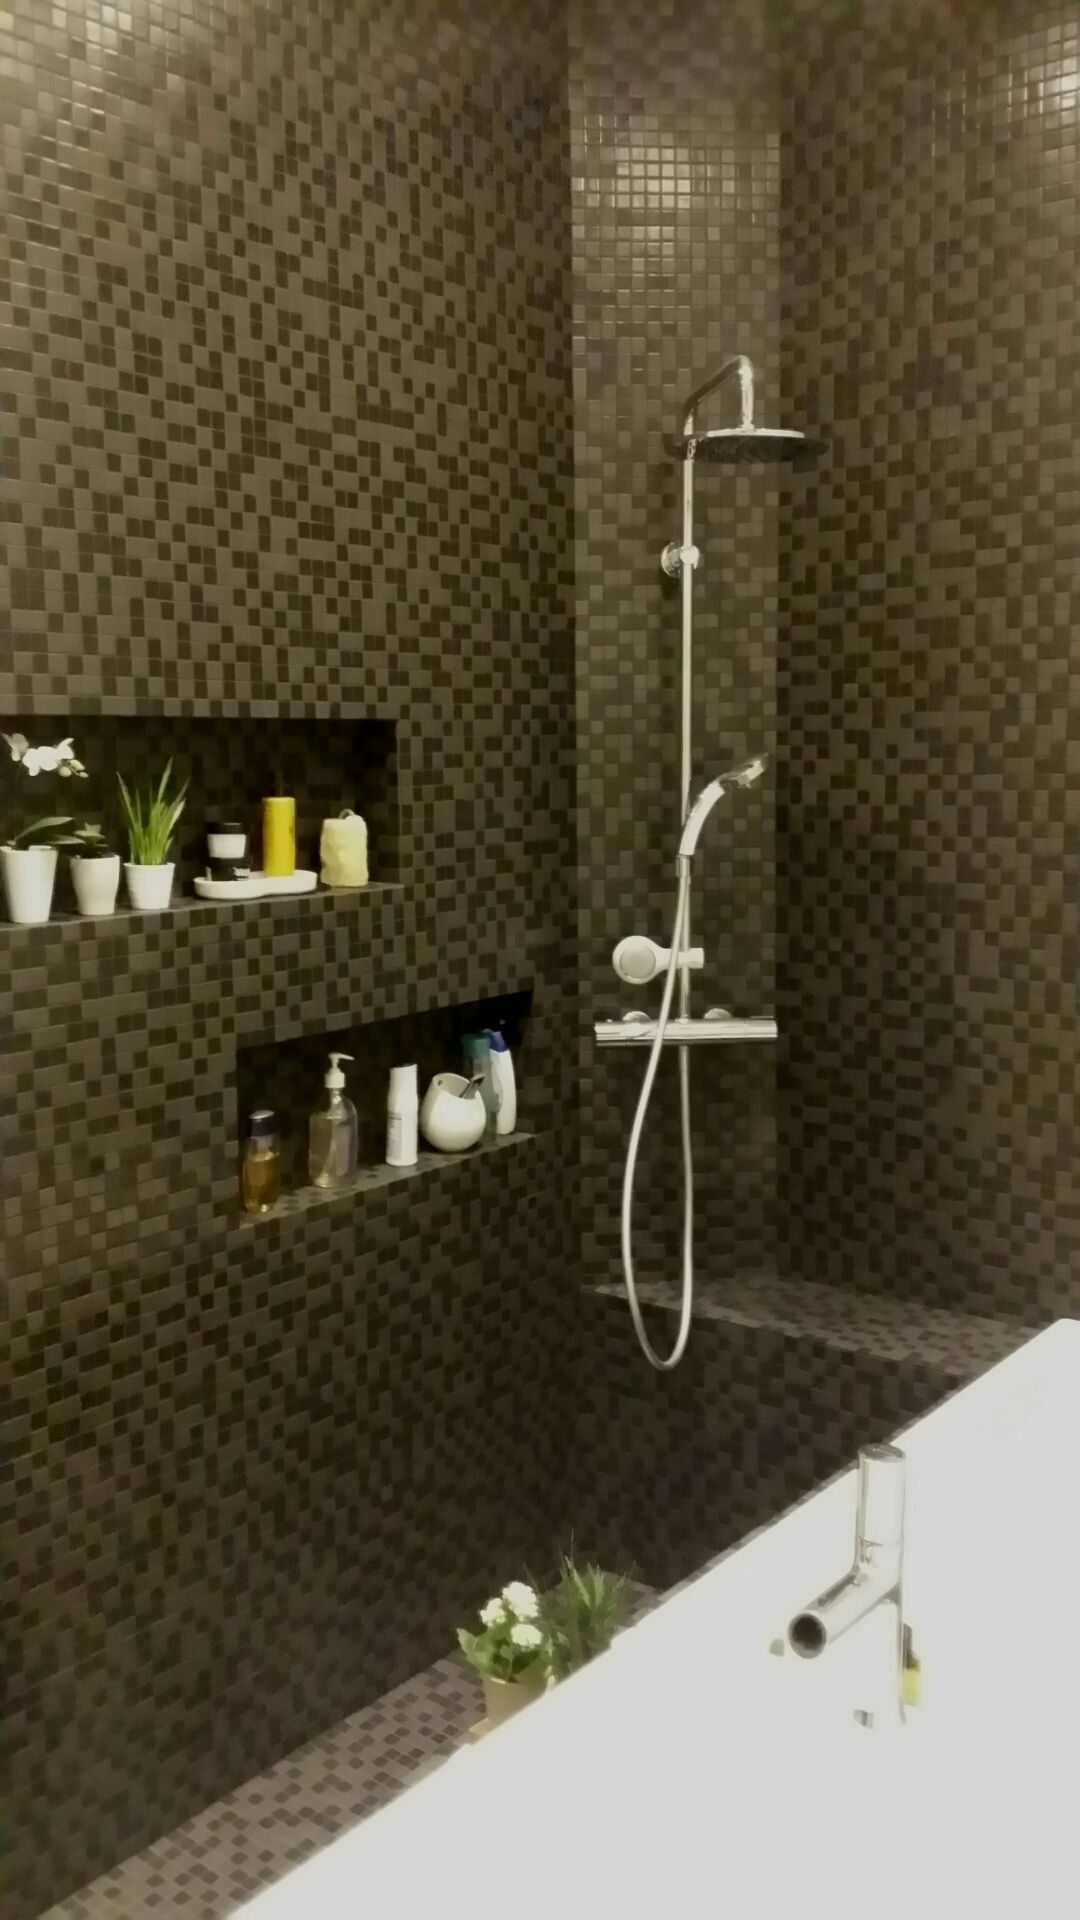 Mosaique noire salle de bain niche CDECO.jpg | SALLE DE BAIN I ...